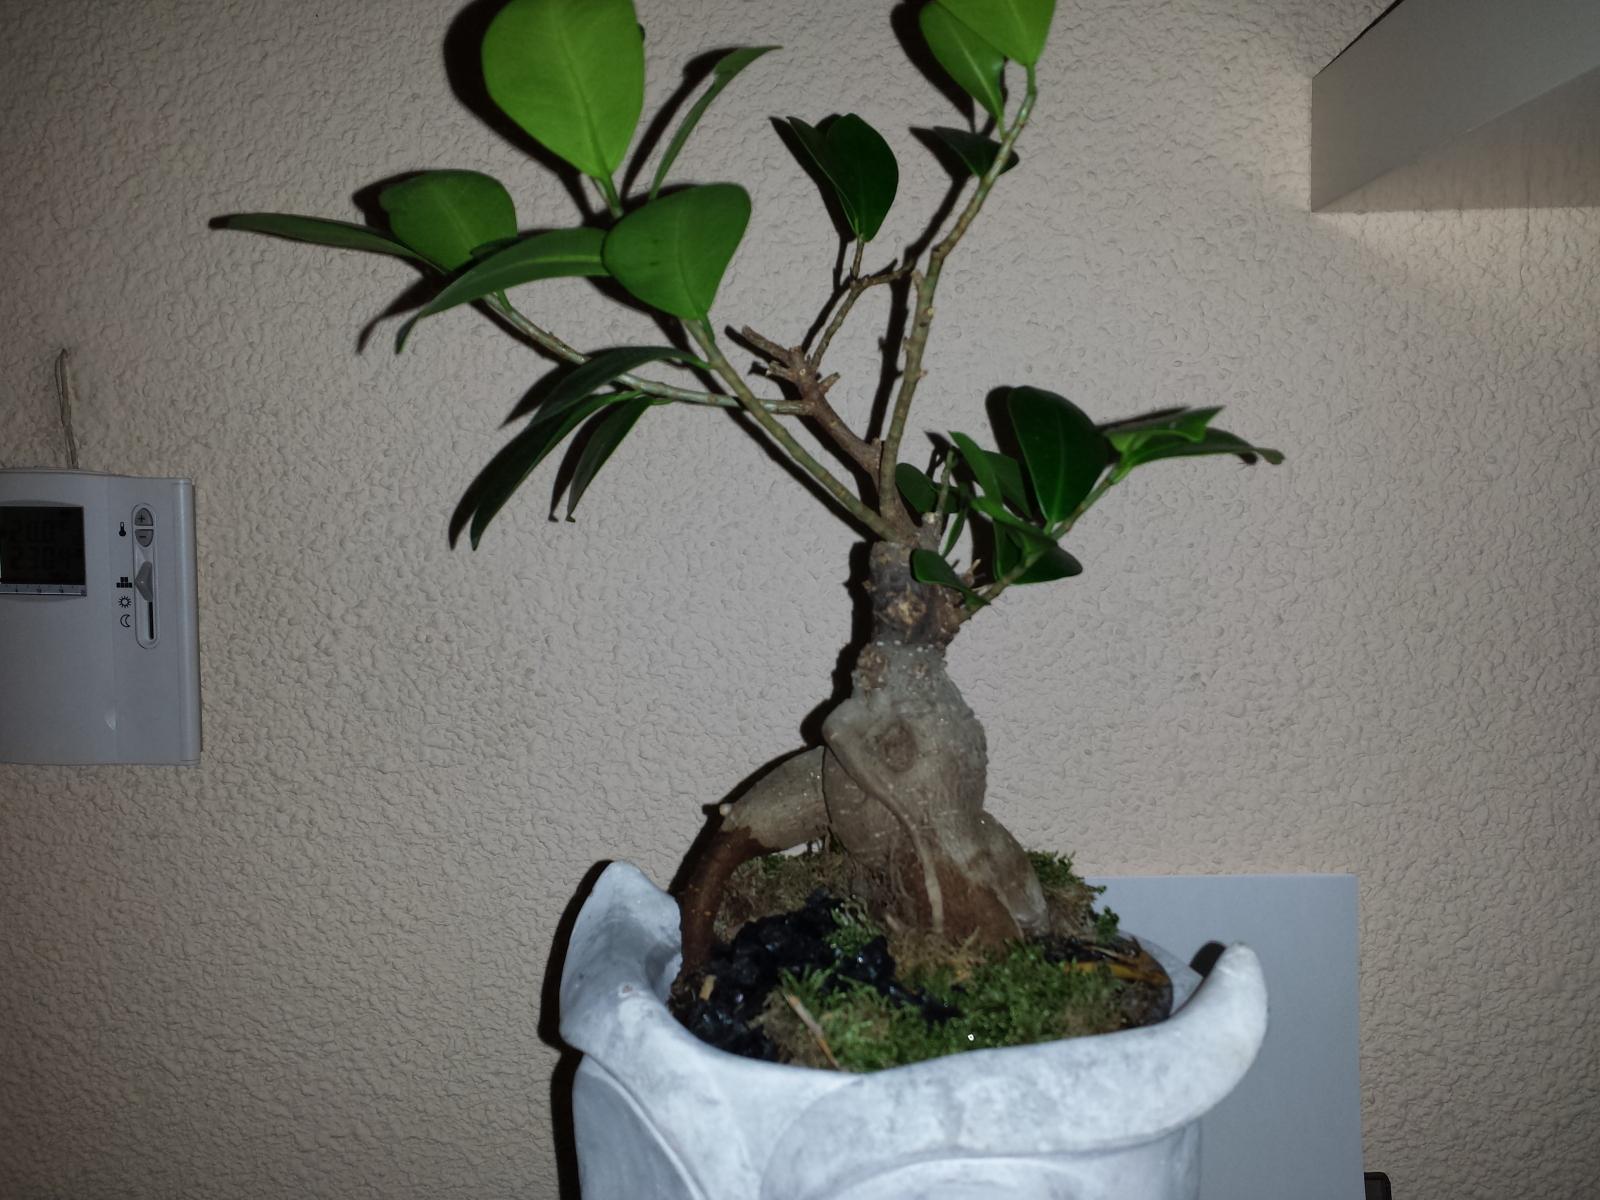 Mi bonsai ficus ginseng se está secando 33vfc4j